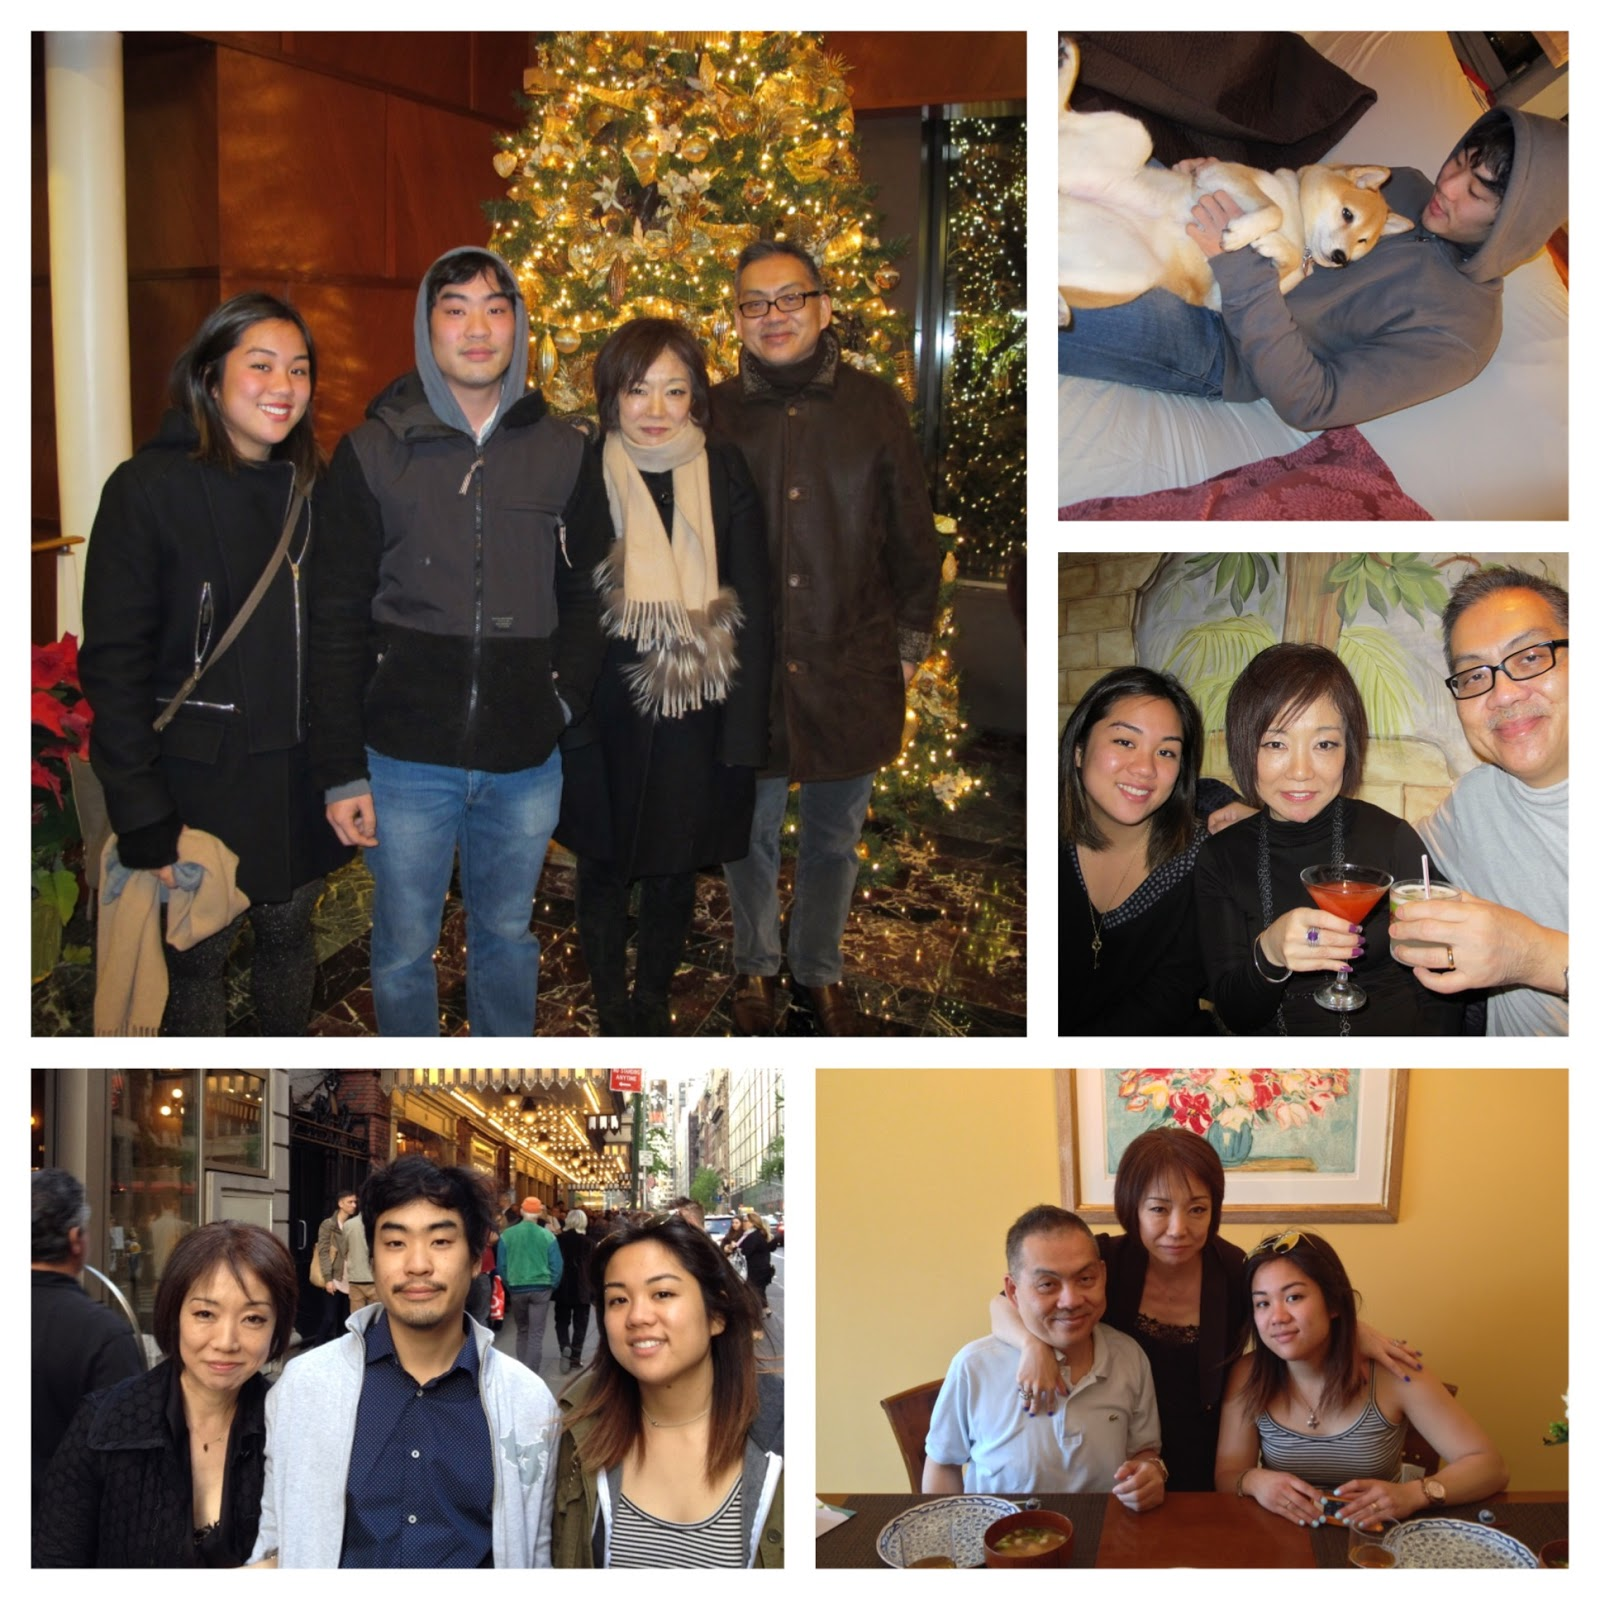 Siu Family Holiday Greetings